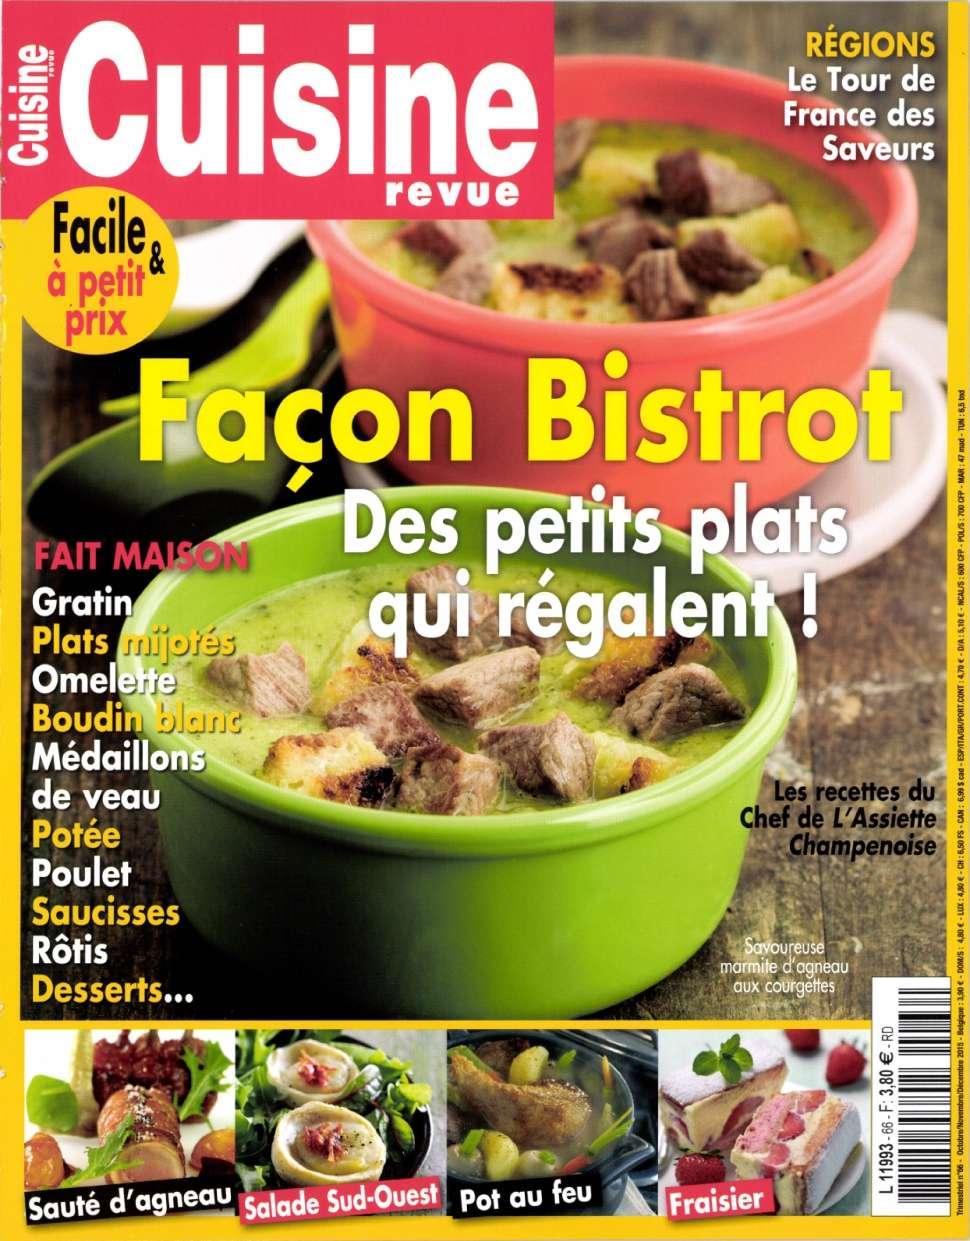 Cuisine Revue 66 - Octobre / Decembre 2015